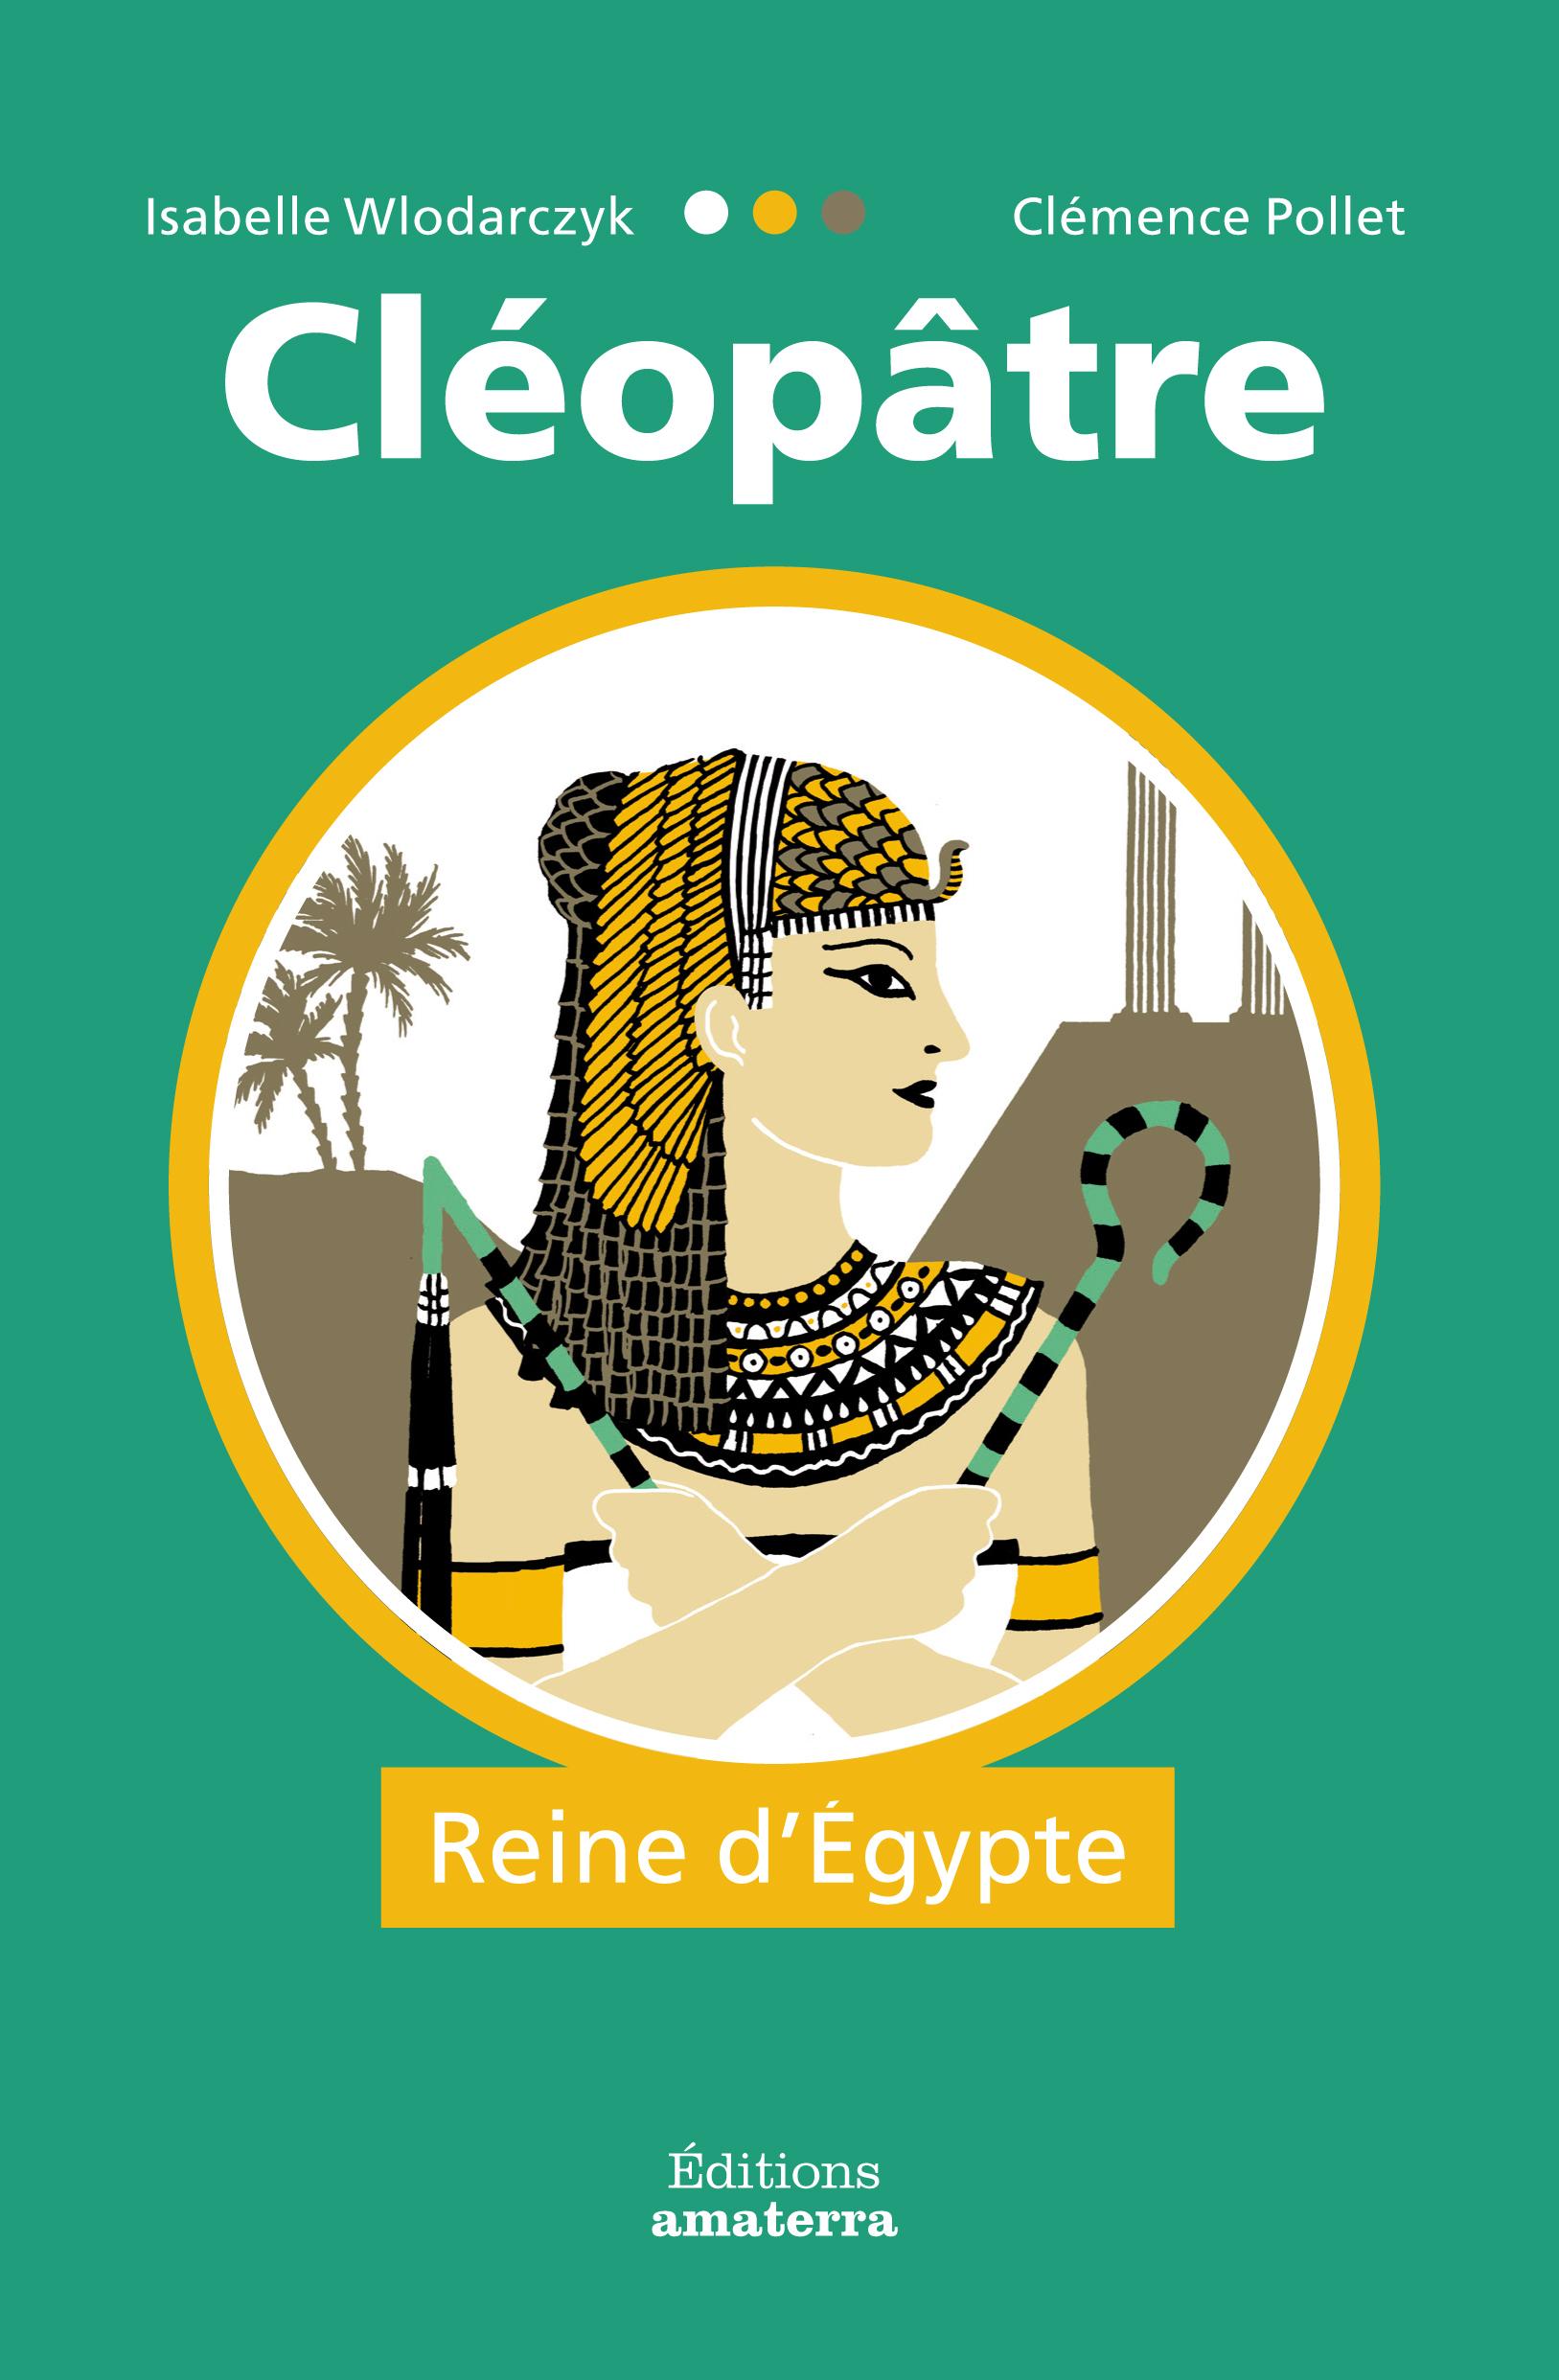 CLEOPATRE, REINE D'EGYPTE